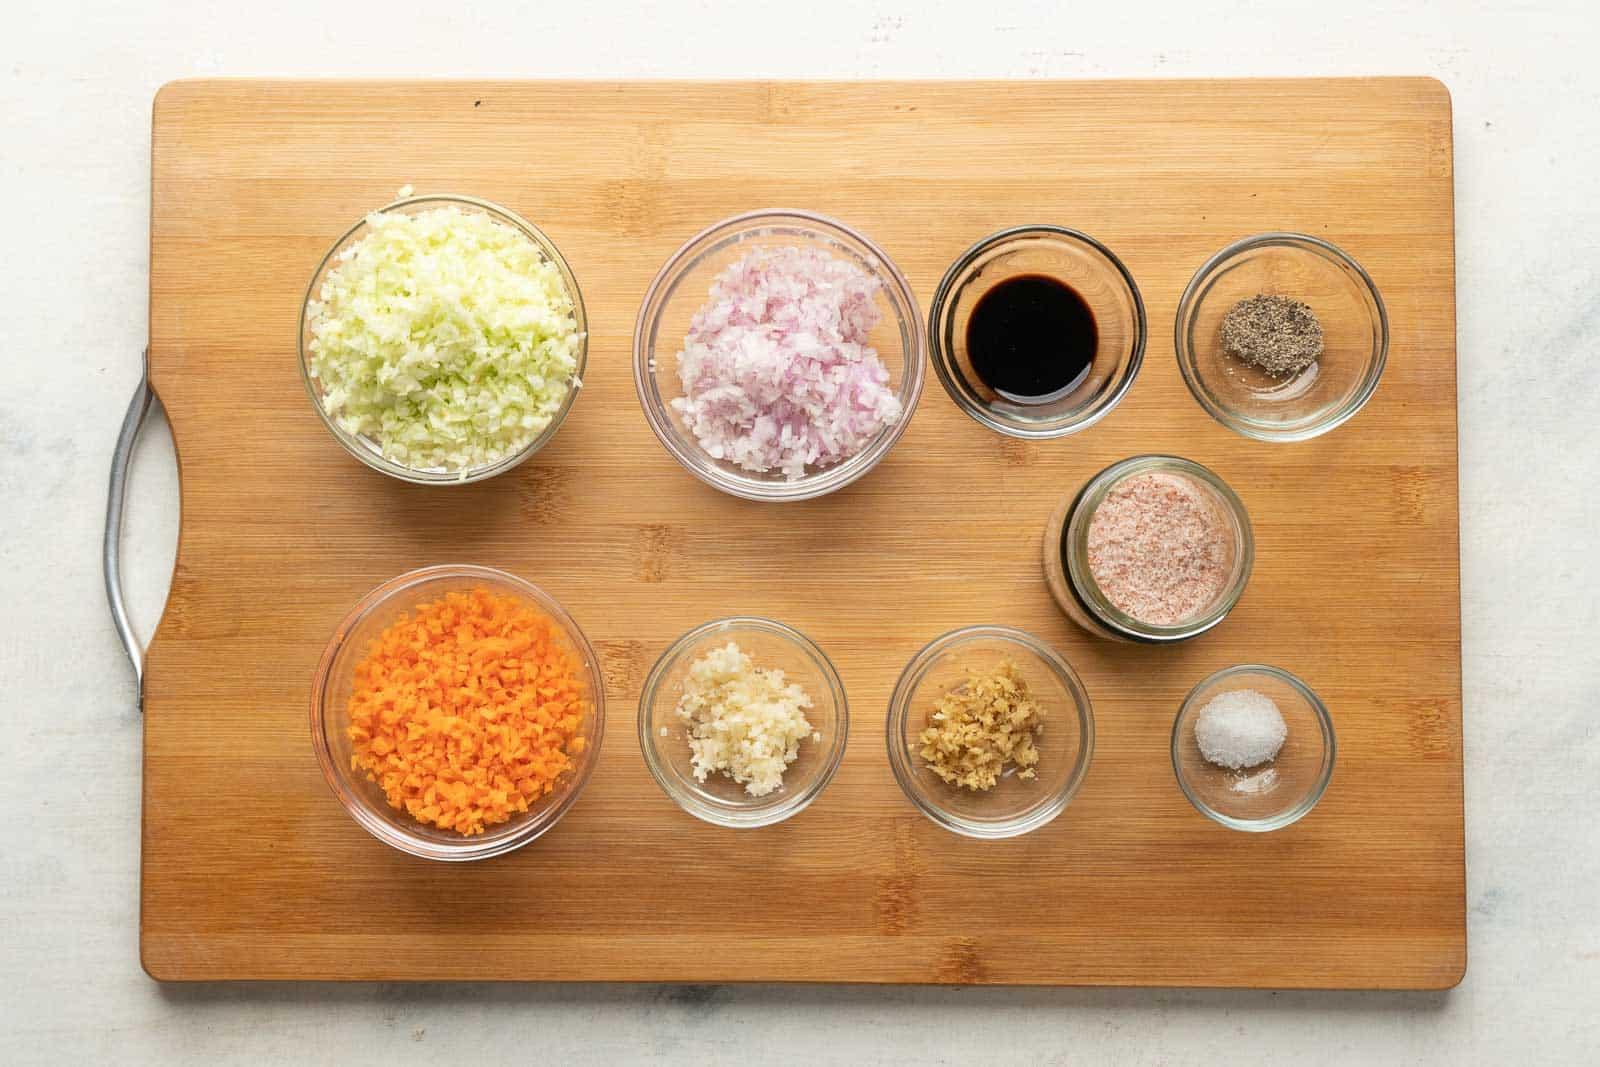 Ingredients for the vegetarian momos filling